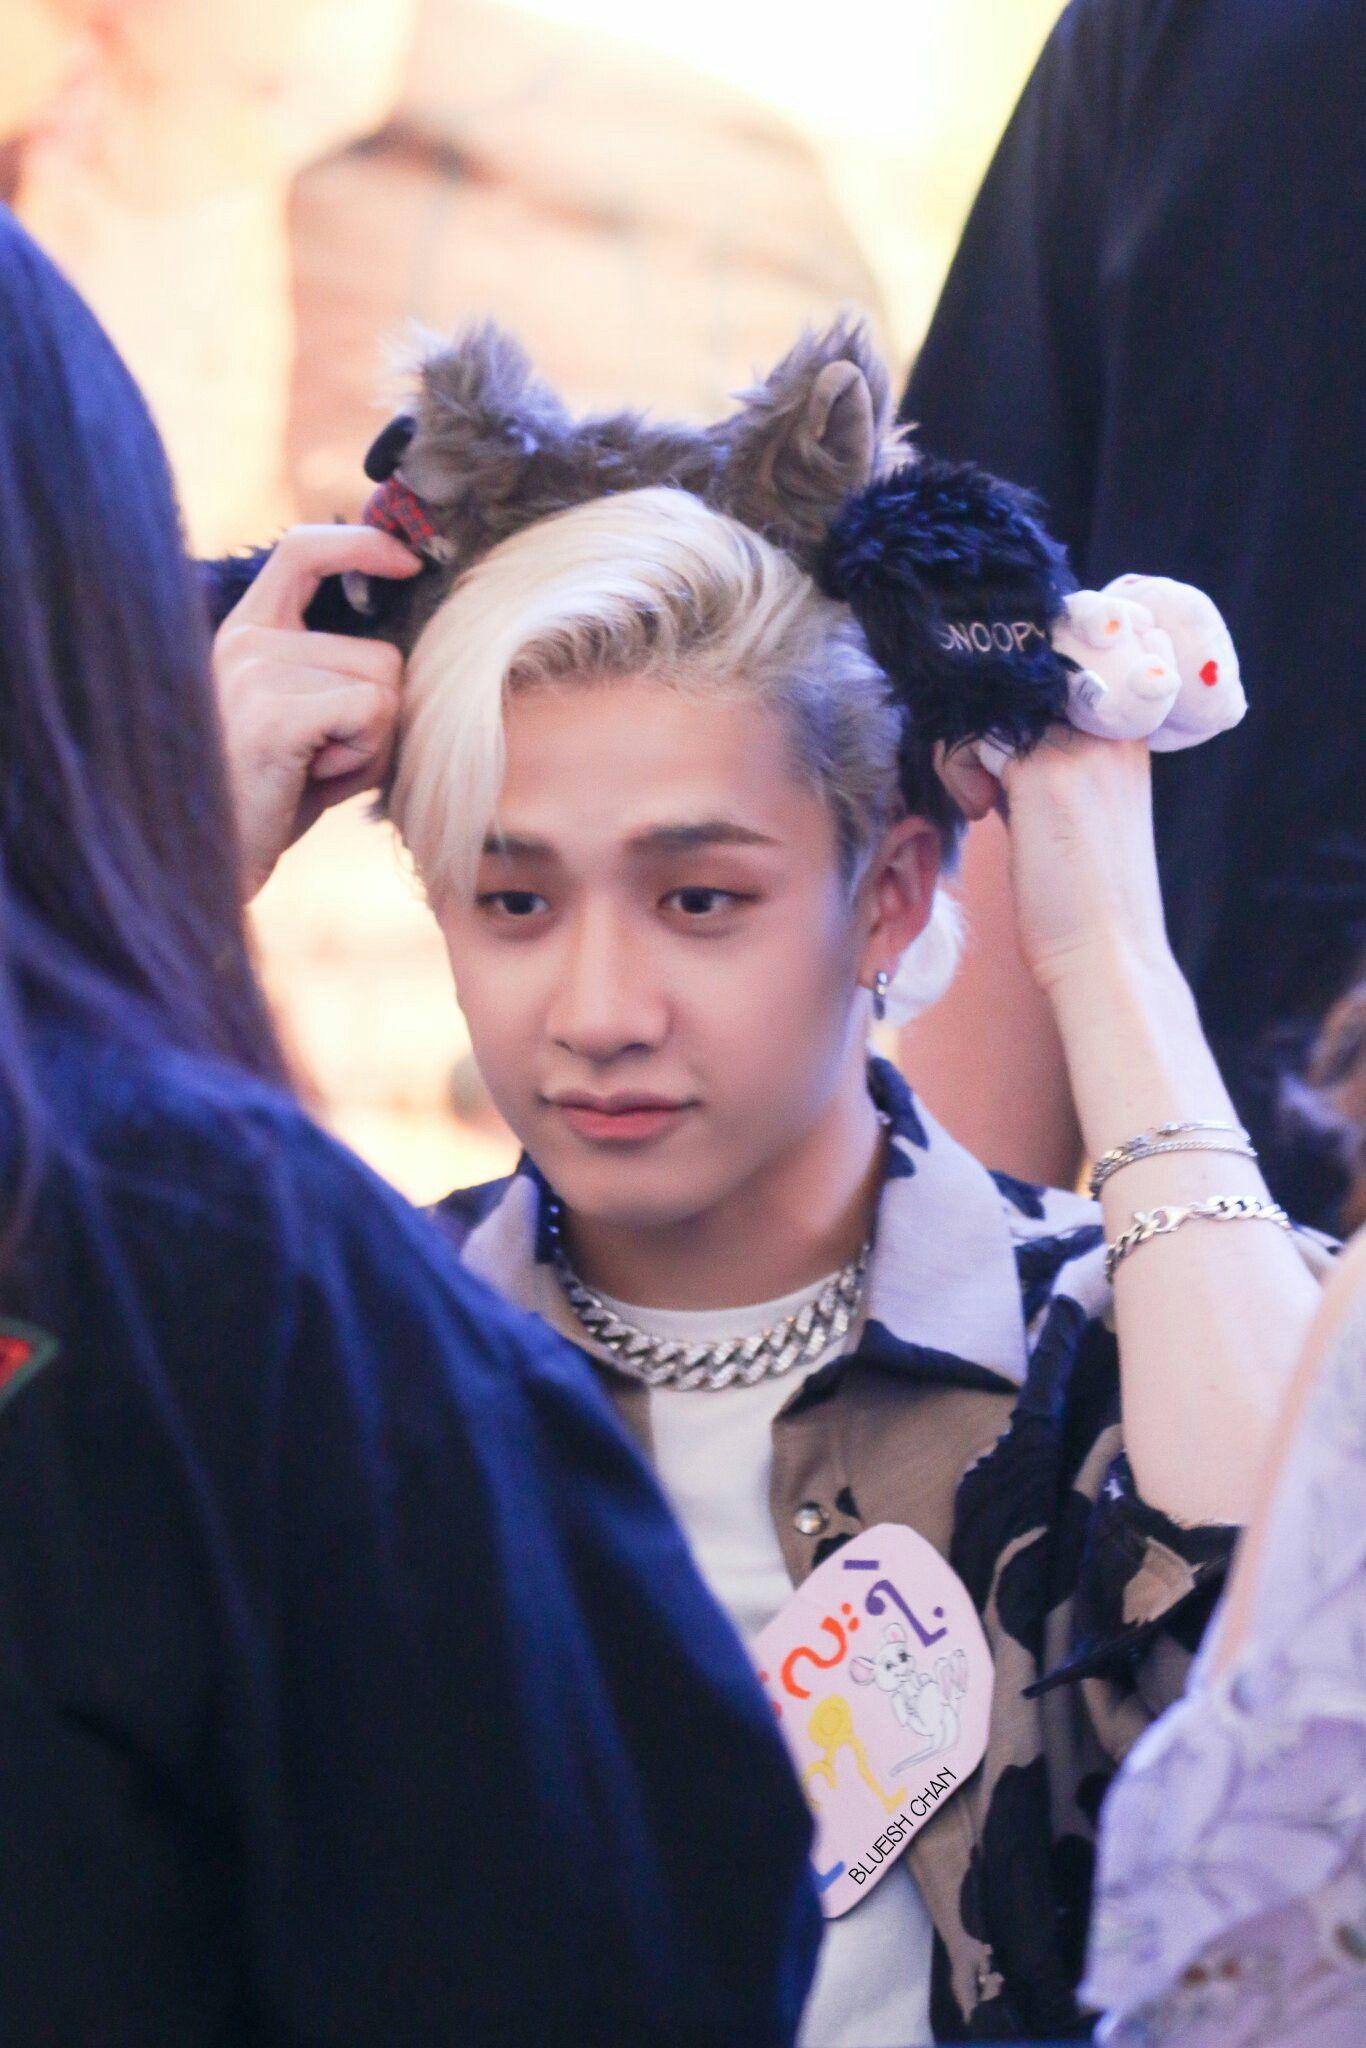 ーstrαykιdѕ image by SKZ Pics Bangs, Korean idol, Stray